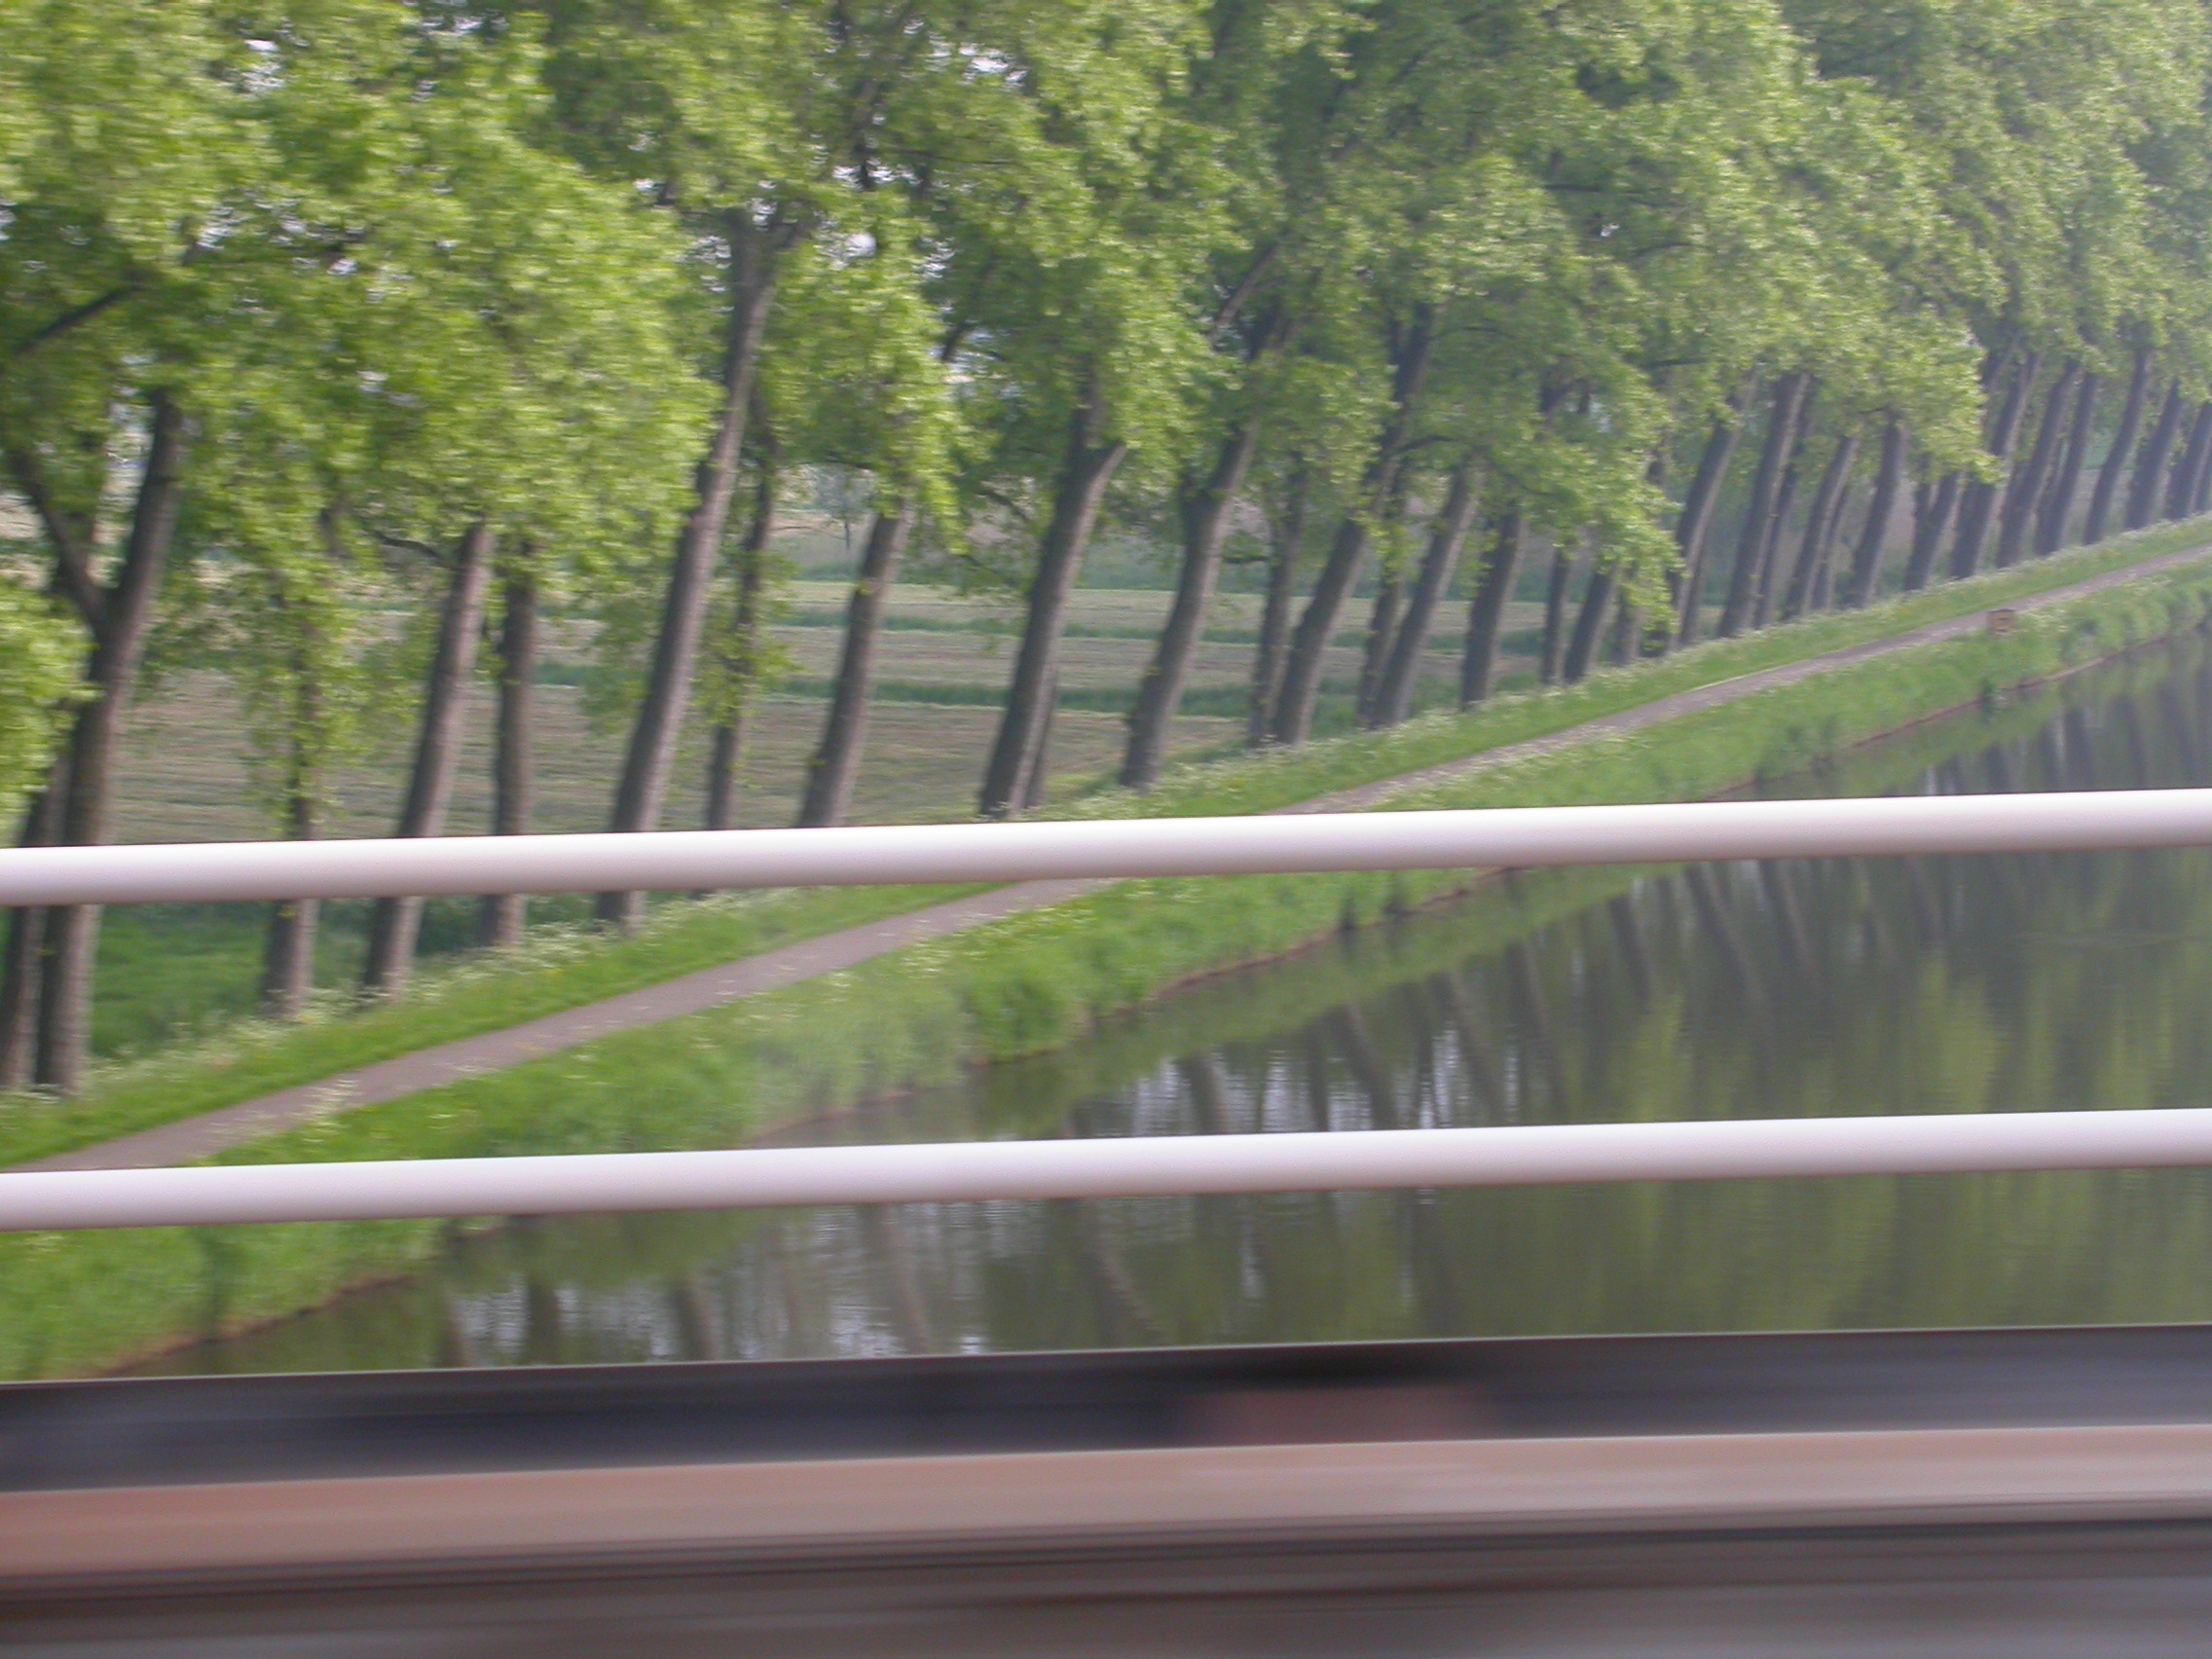 paul speed speeding bridge water river railing